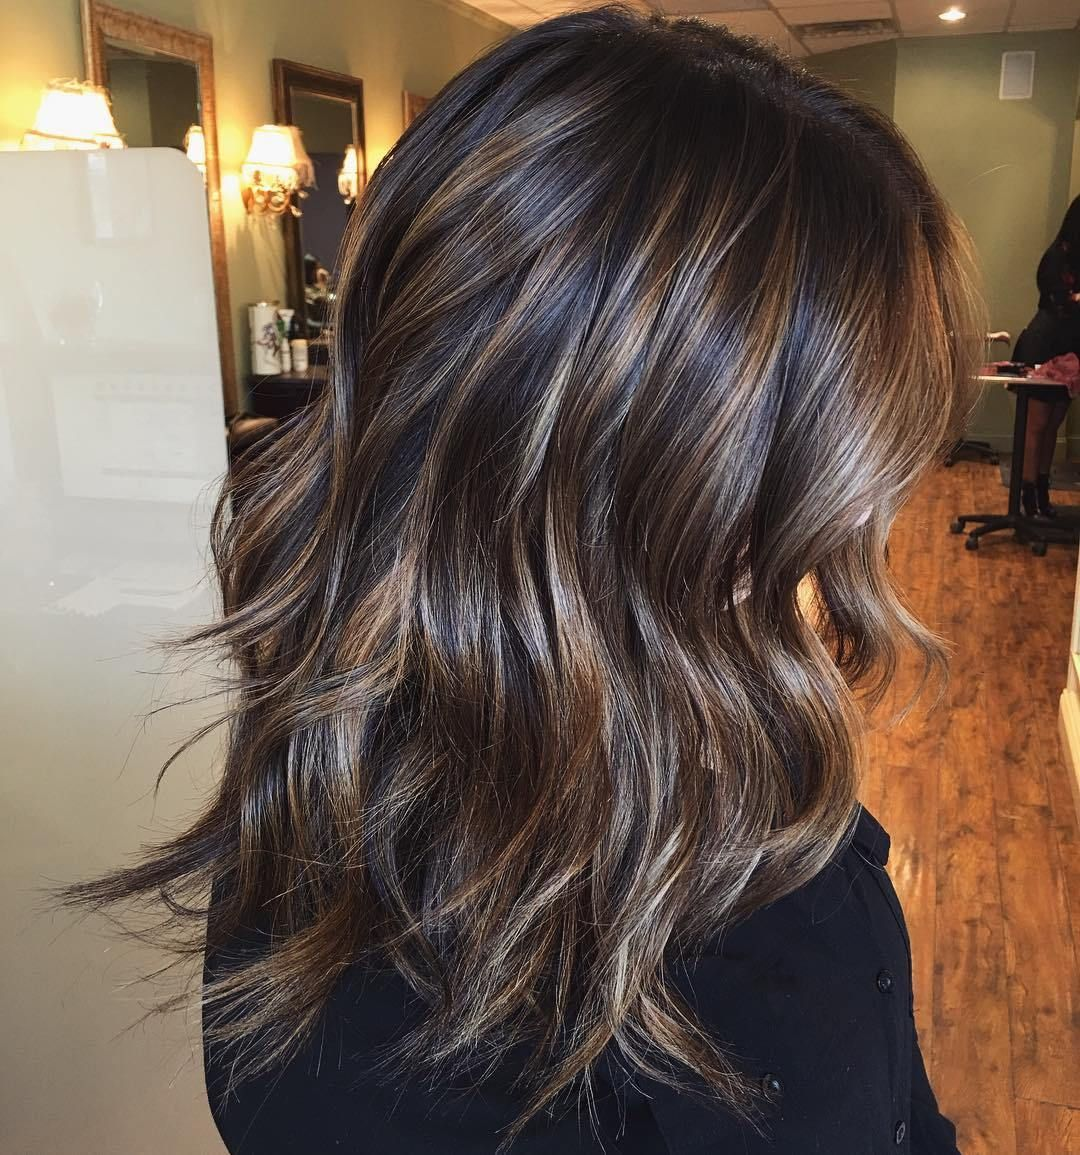 12 Best Medium-Length Hairstyles for 12 - Hair Adviser  Hair